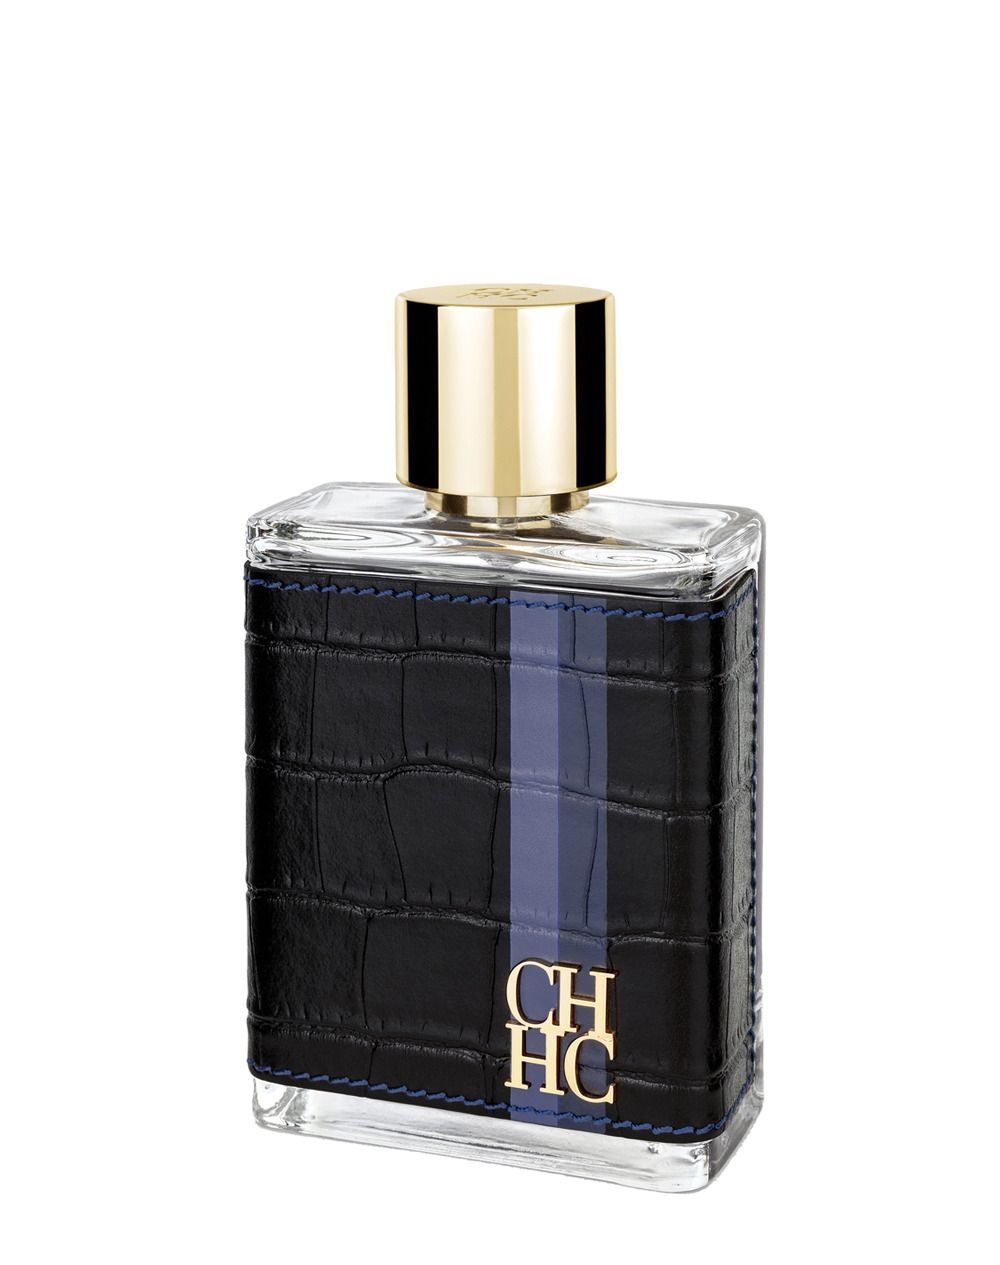 Ch Men Grand Tour By Carolina Herrera Perfume Fragrance Perfume Bottles